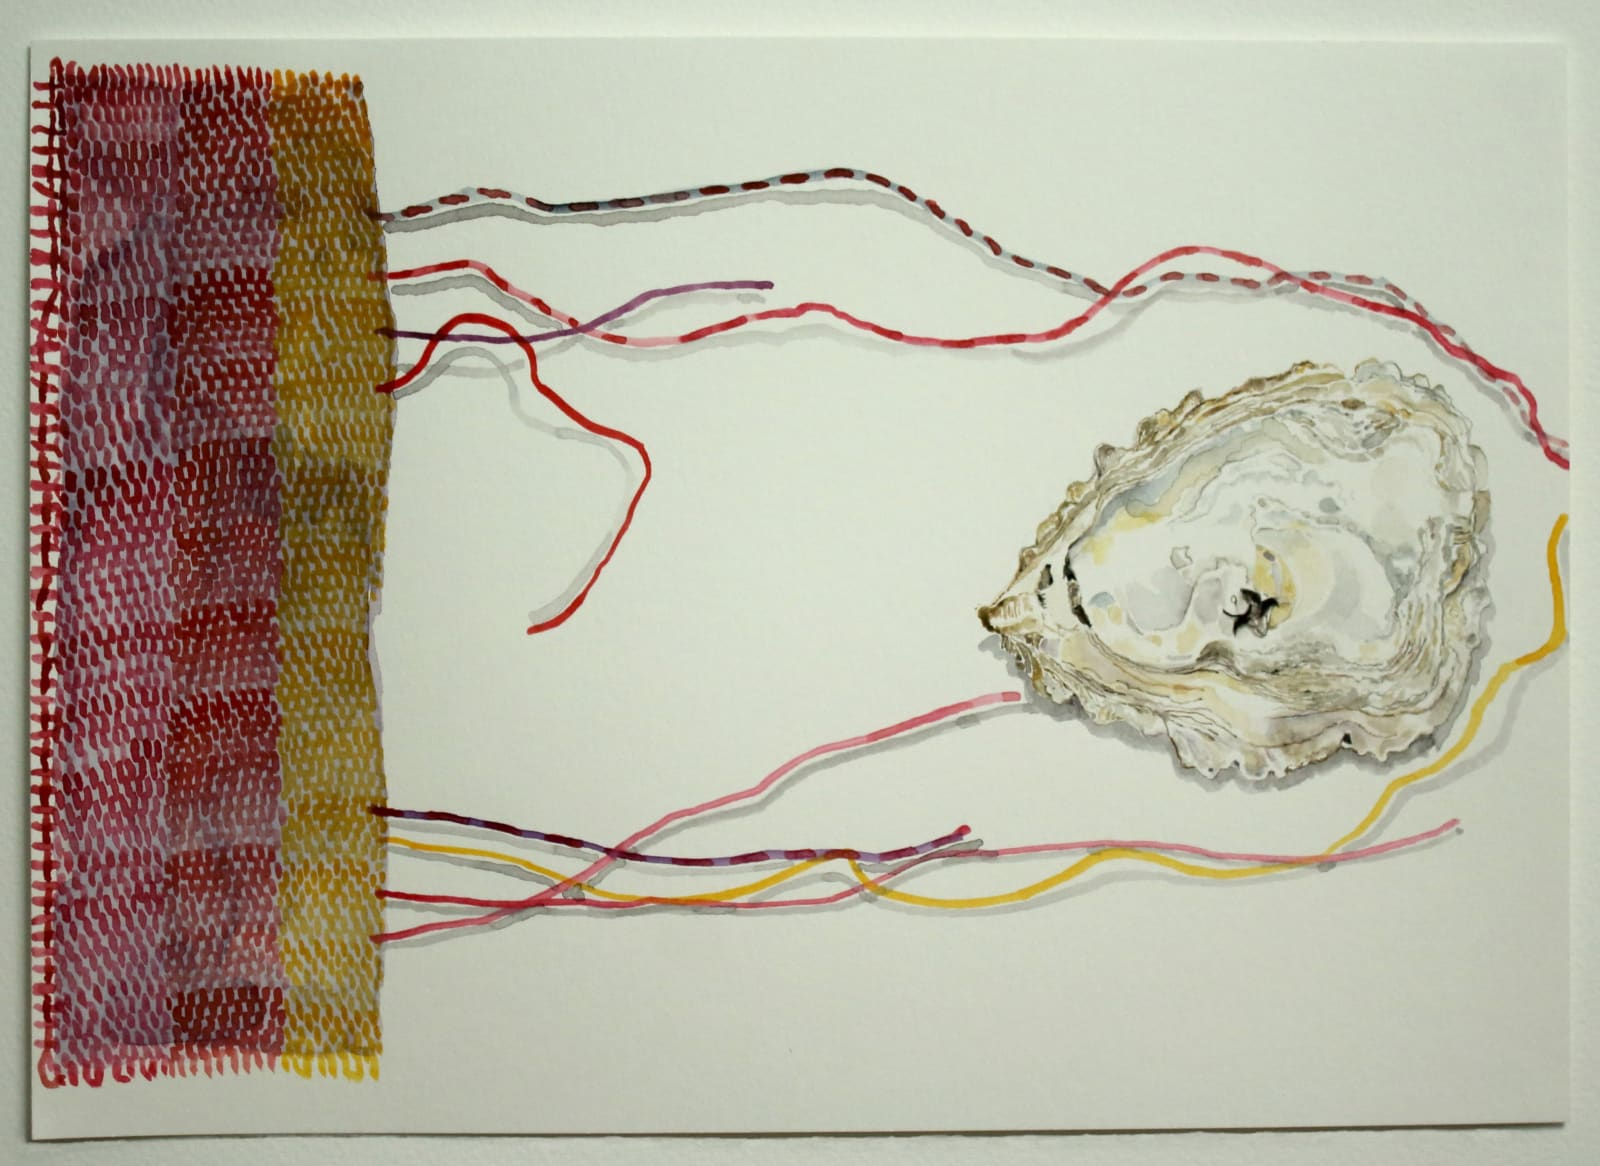 Jocelyn Clarke, Oyster Shell, Bird and Drifting Threads, 2020